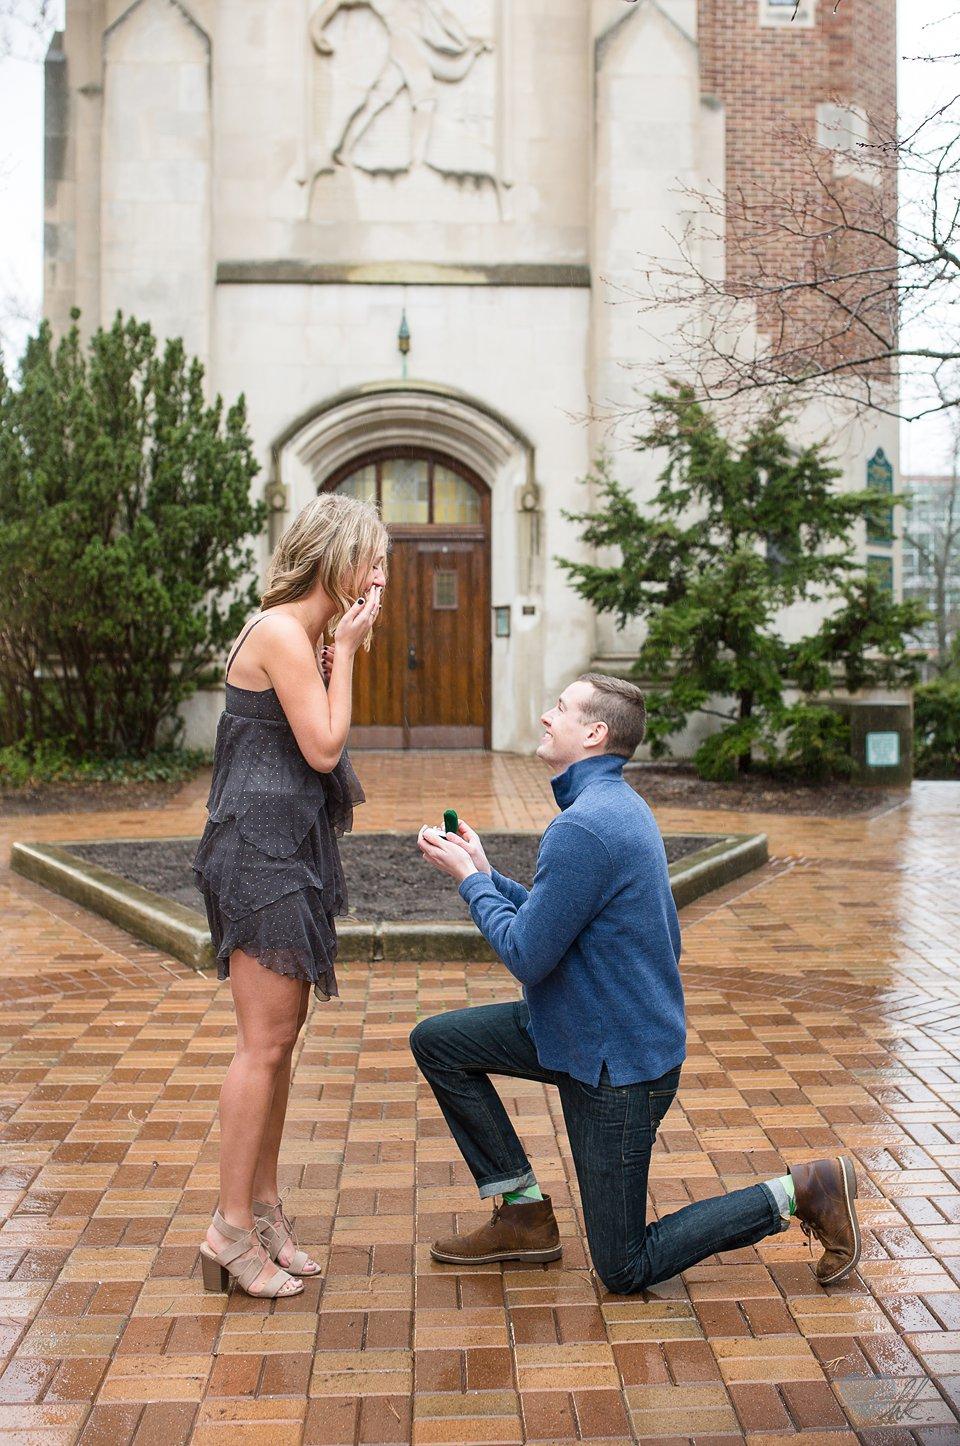 Rainy proposal photographs at Beaumont Tower, MSU